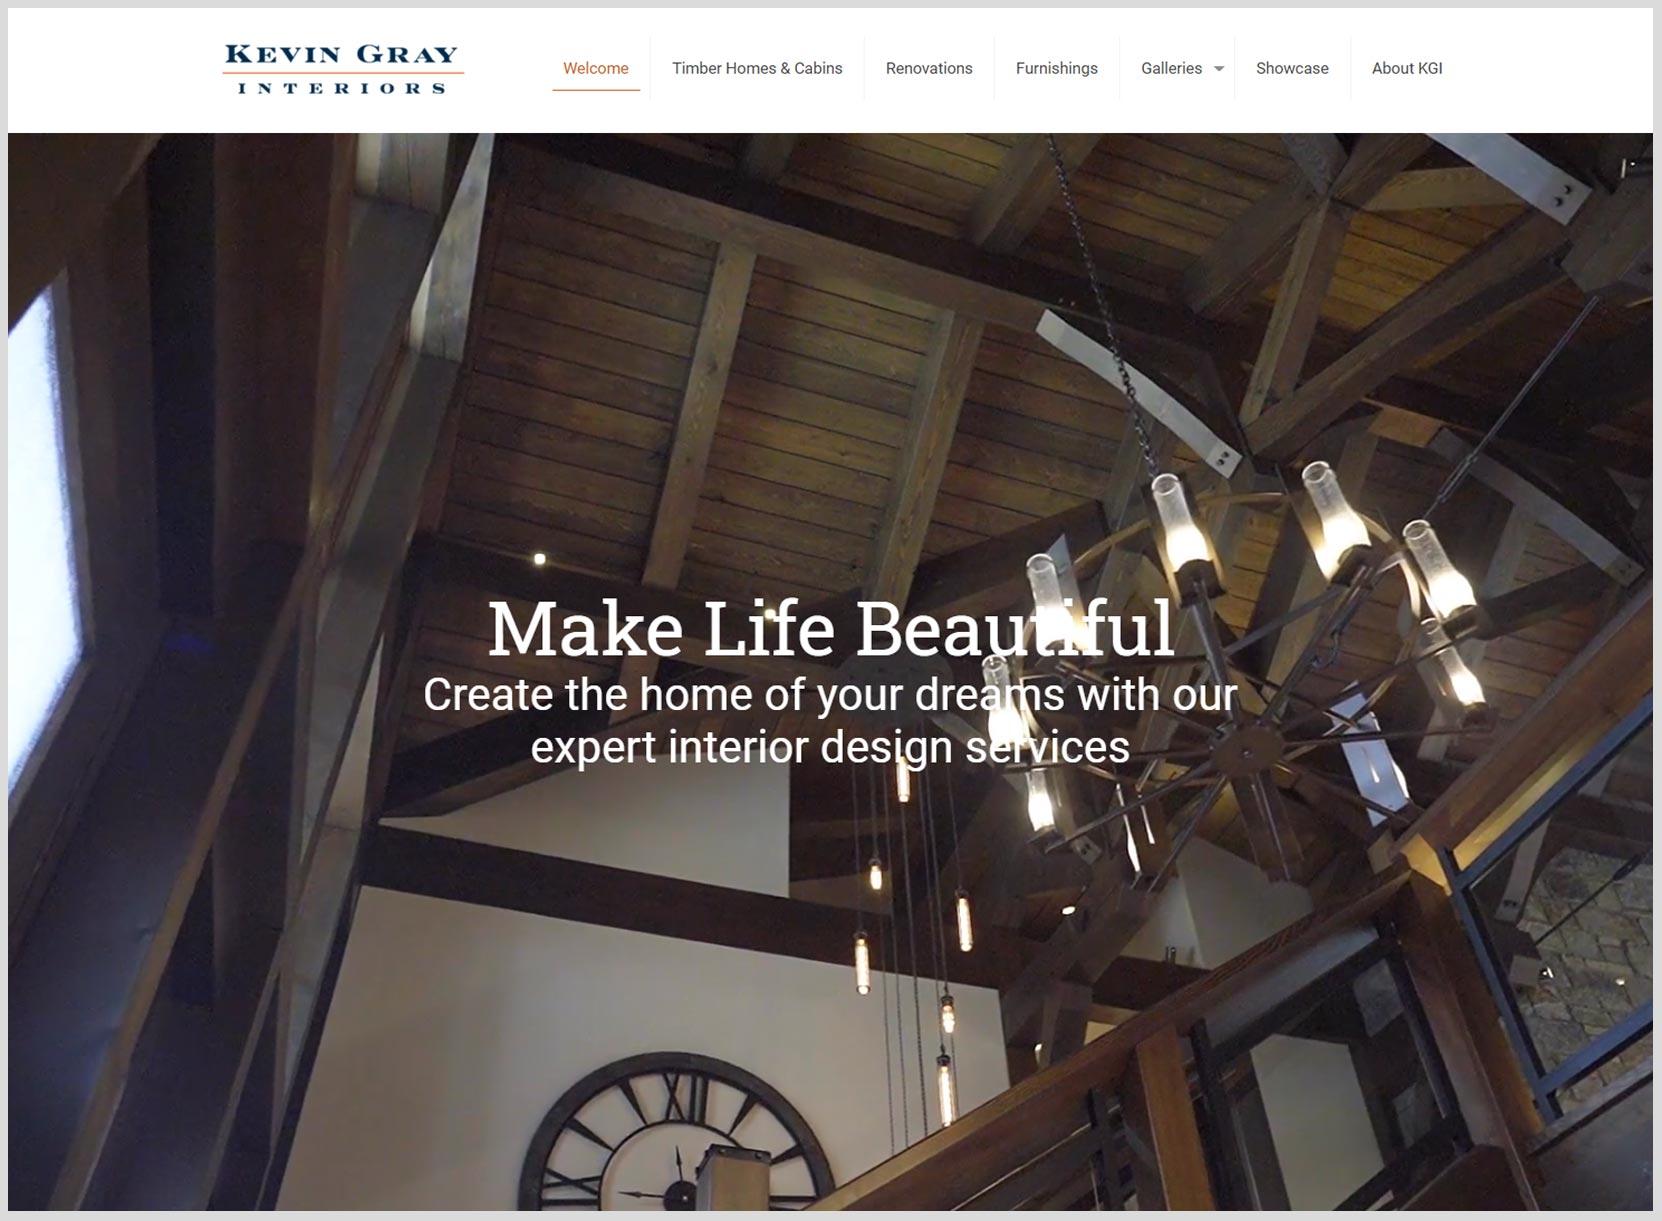 Kevin Gray Interiors Website